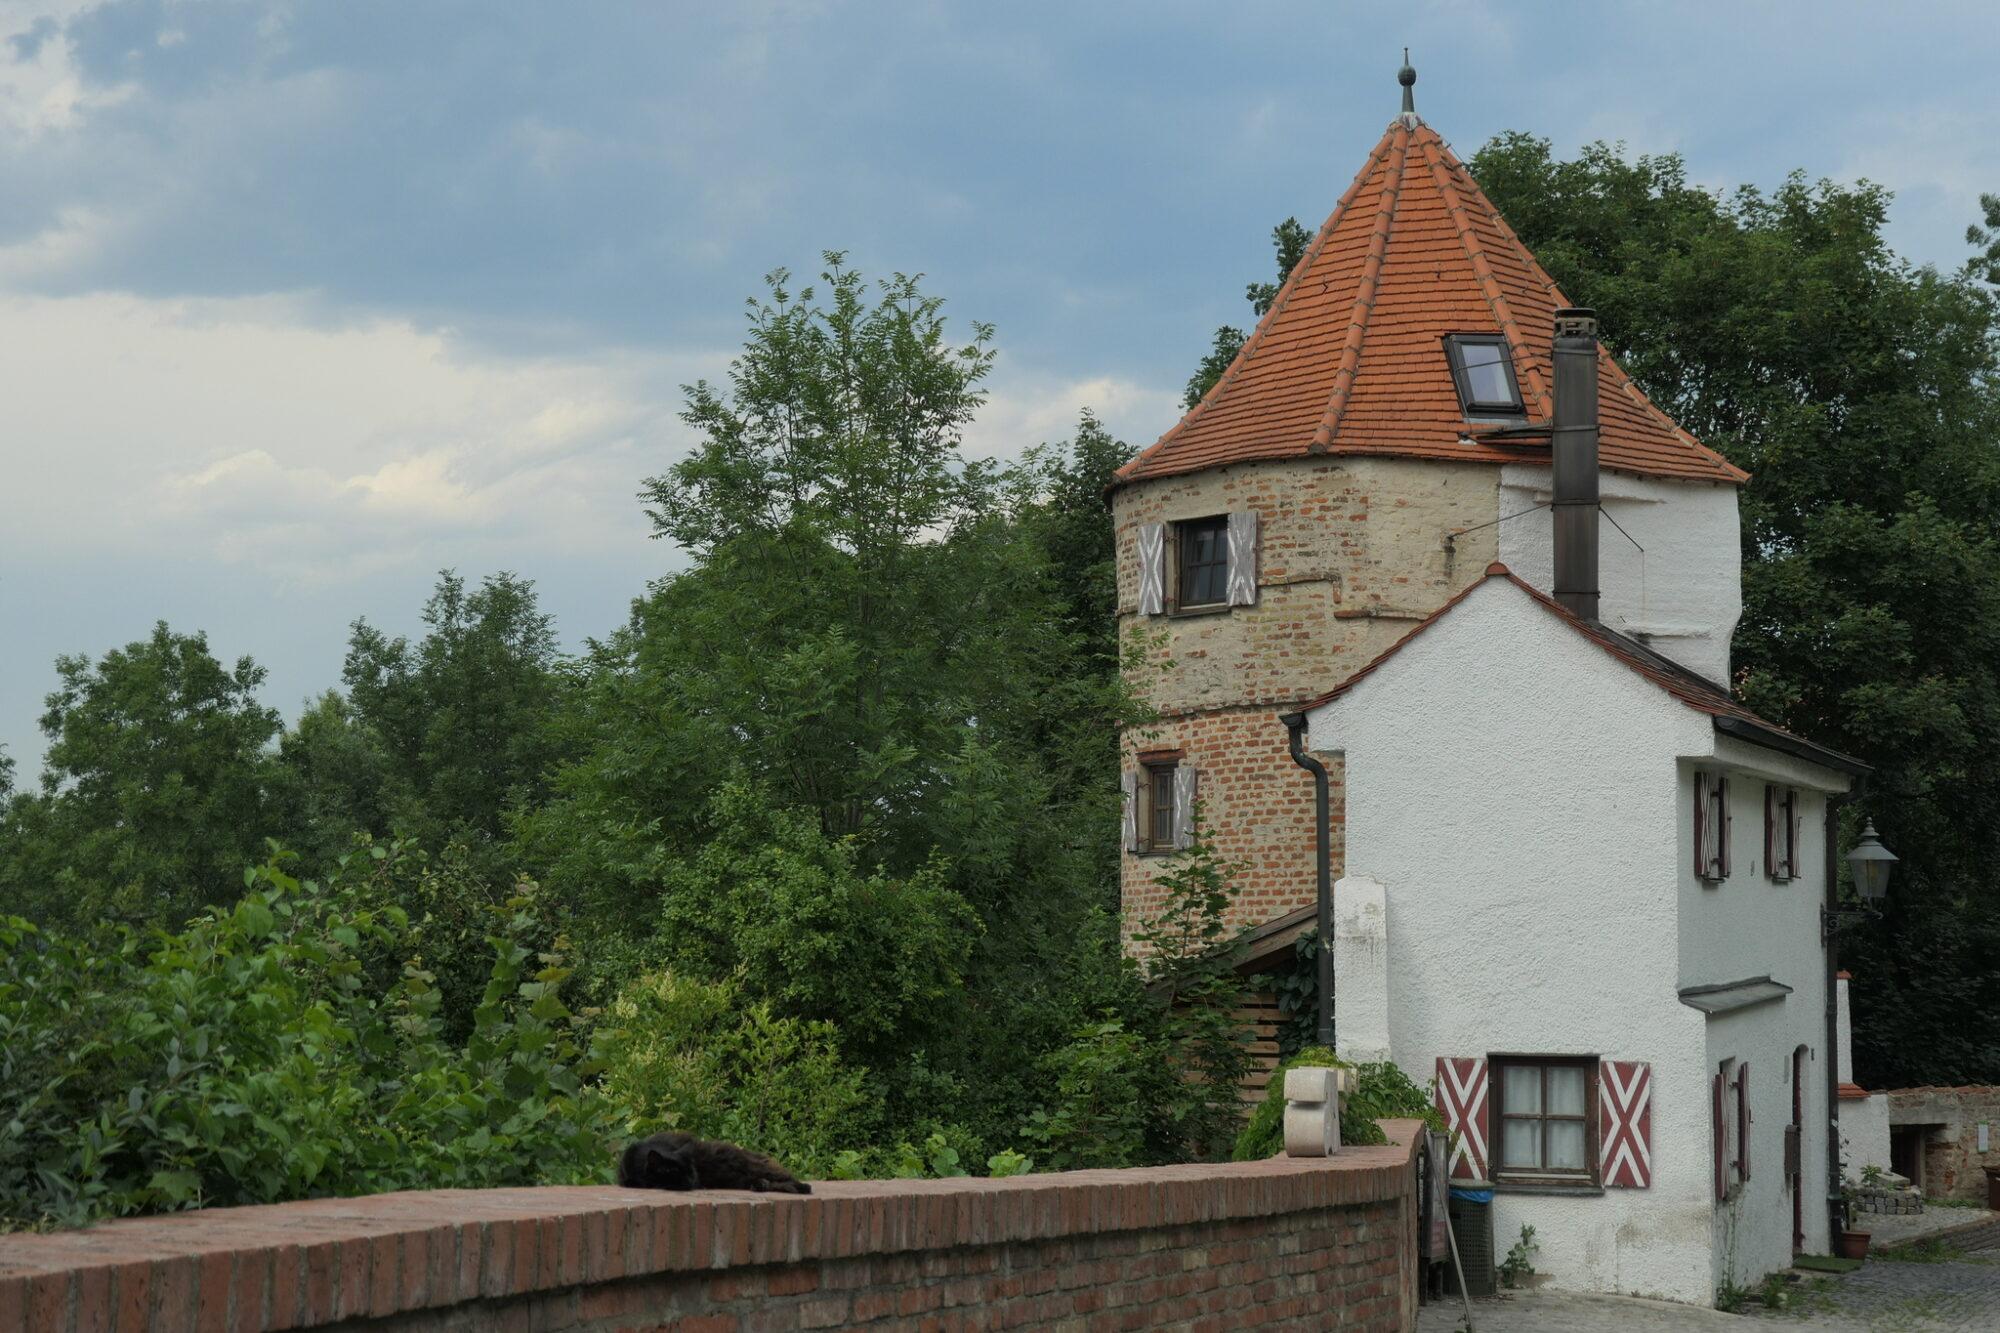 Folterturm (Torture Tower) in Friedberg